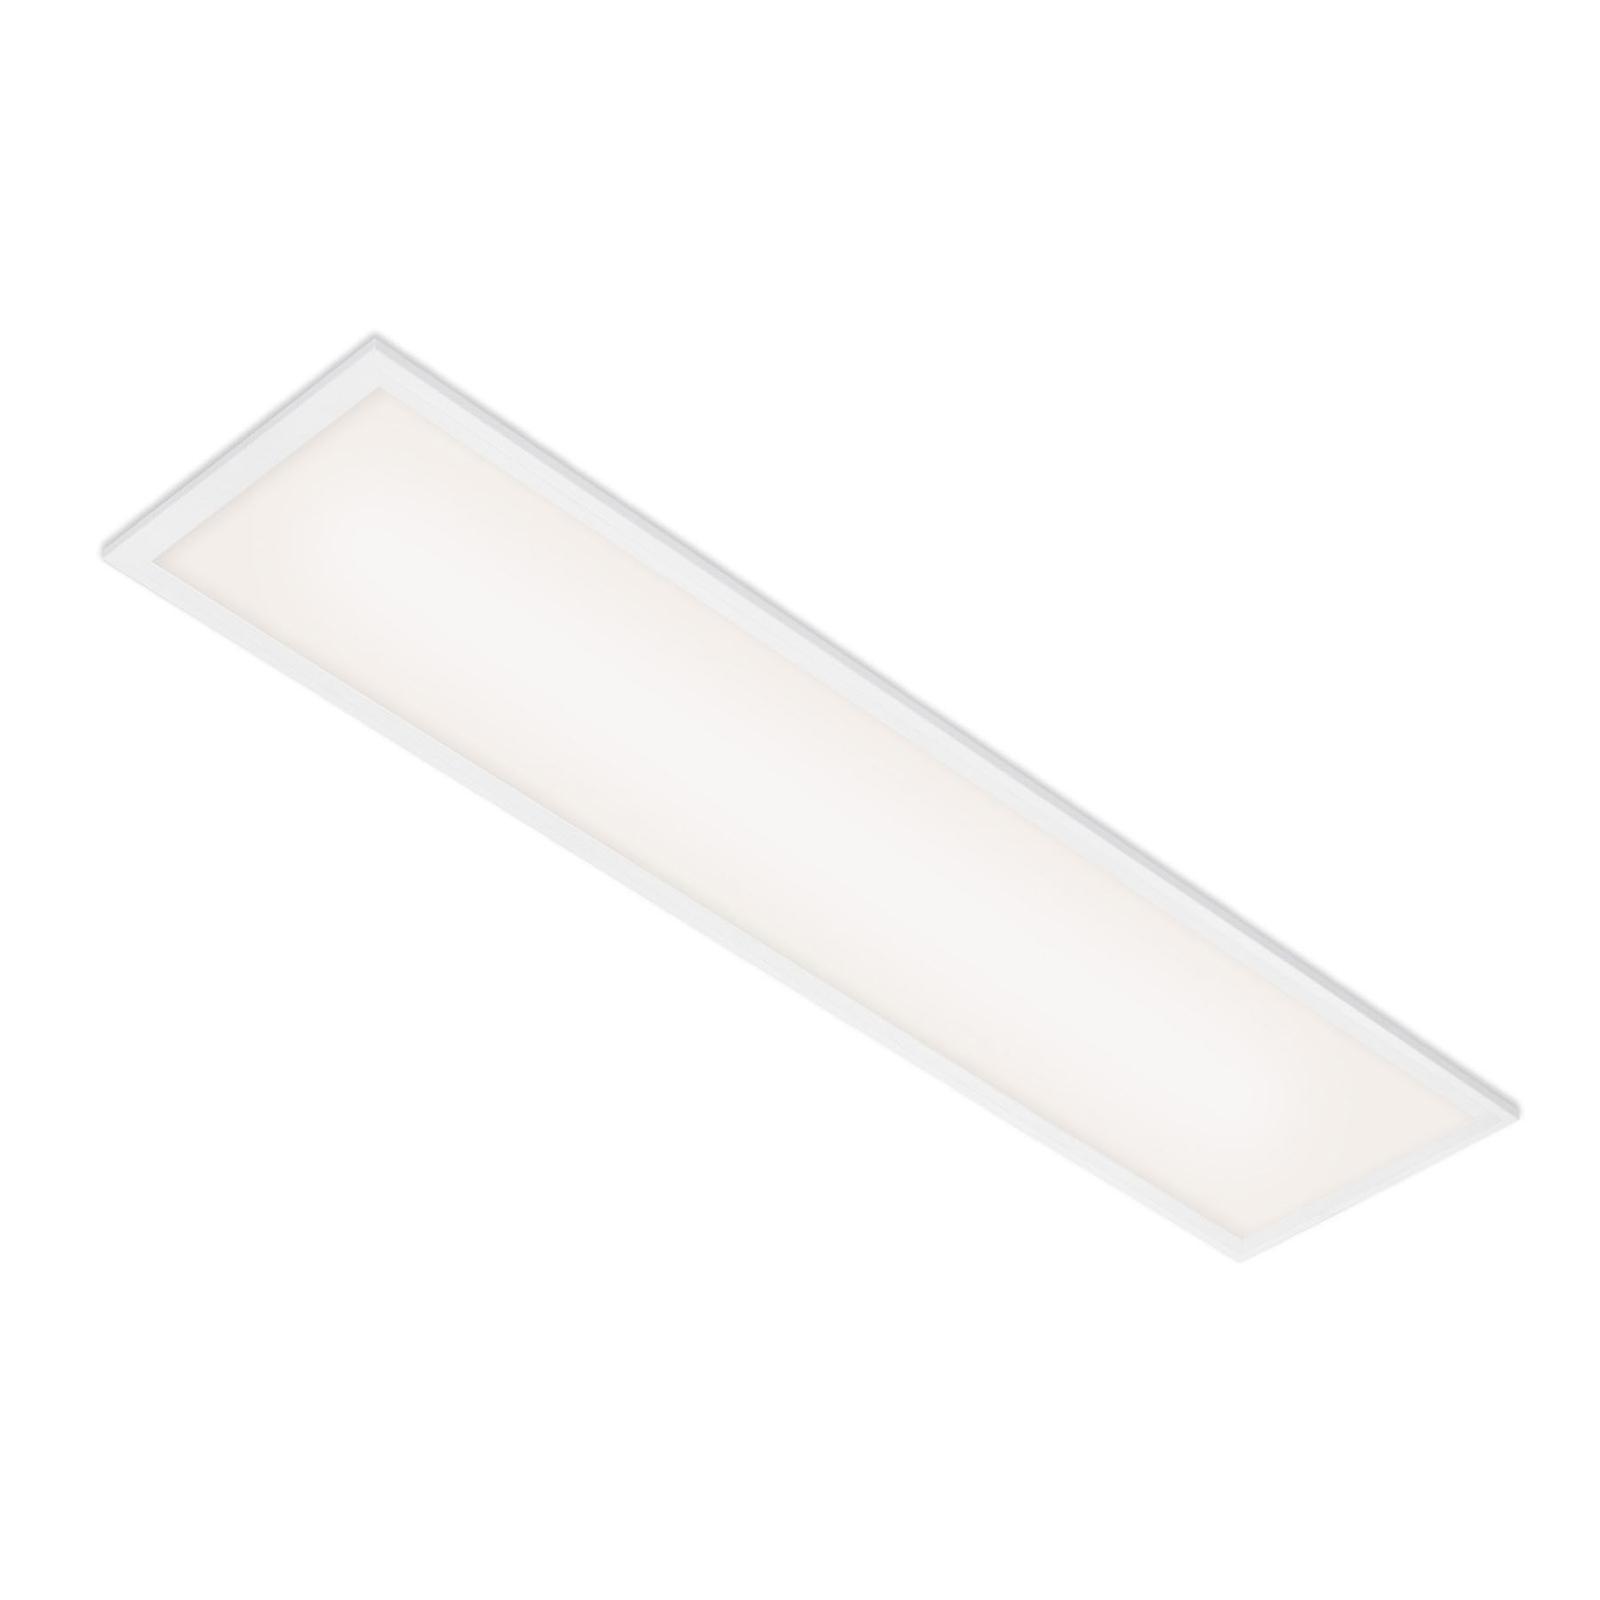 LED-Panel Simple, weiß, ultraflach, 100x25cm